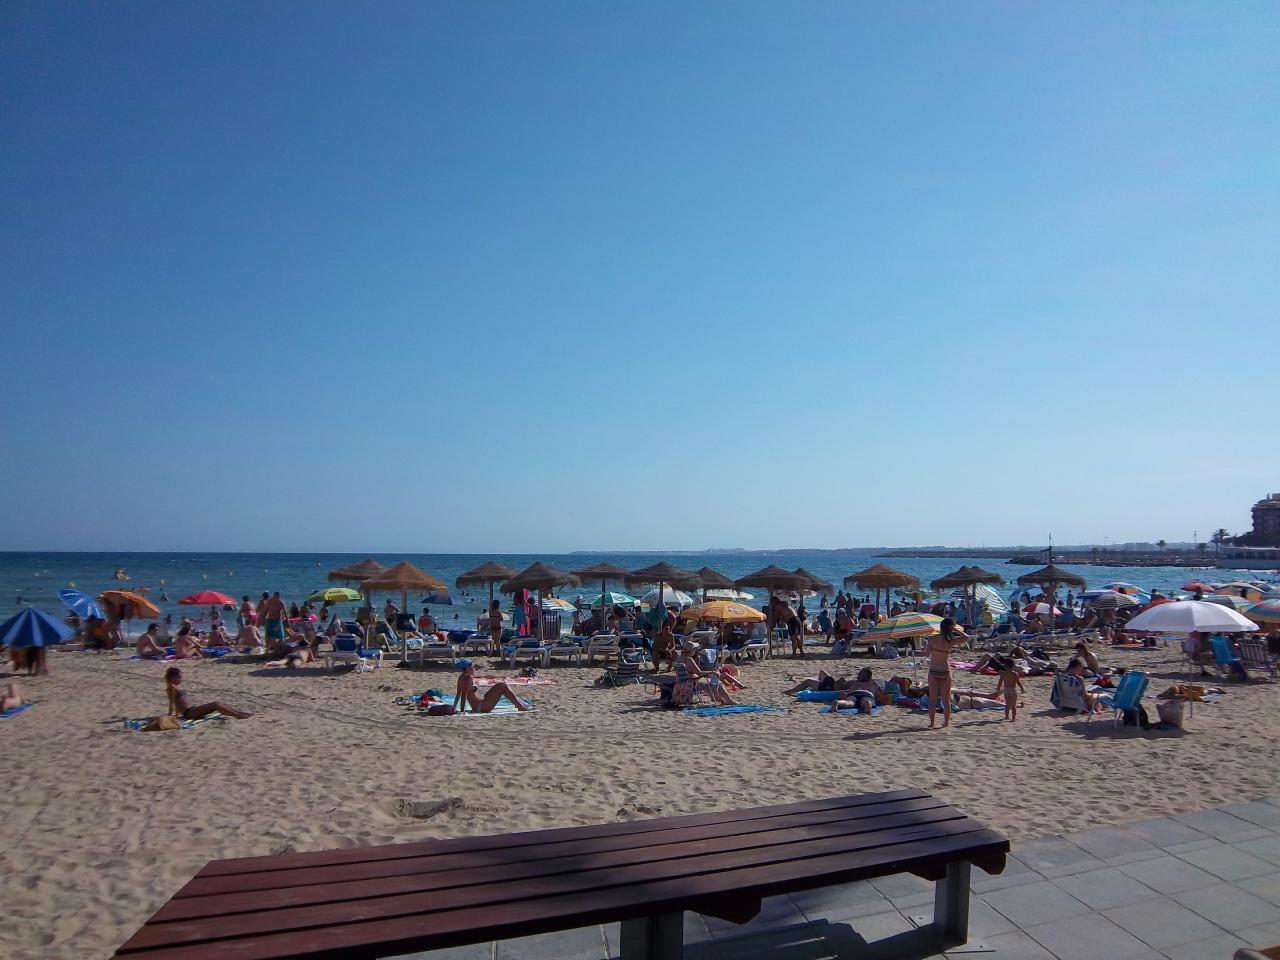 Appartement de vacances mit Parkplatz und Pool (2068497), Torrevieja, Costa Blanca, Valence, Espagne, image 22